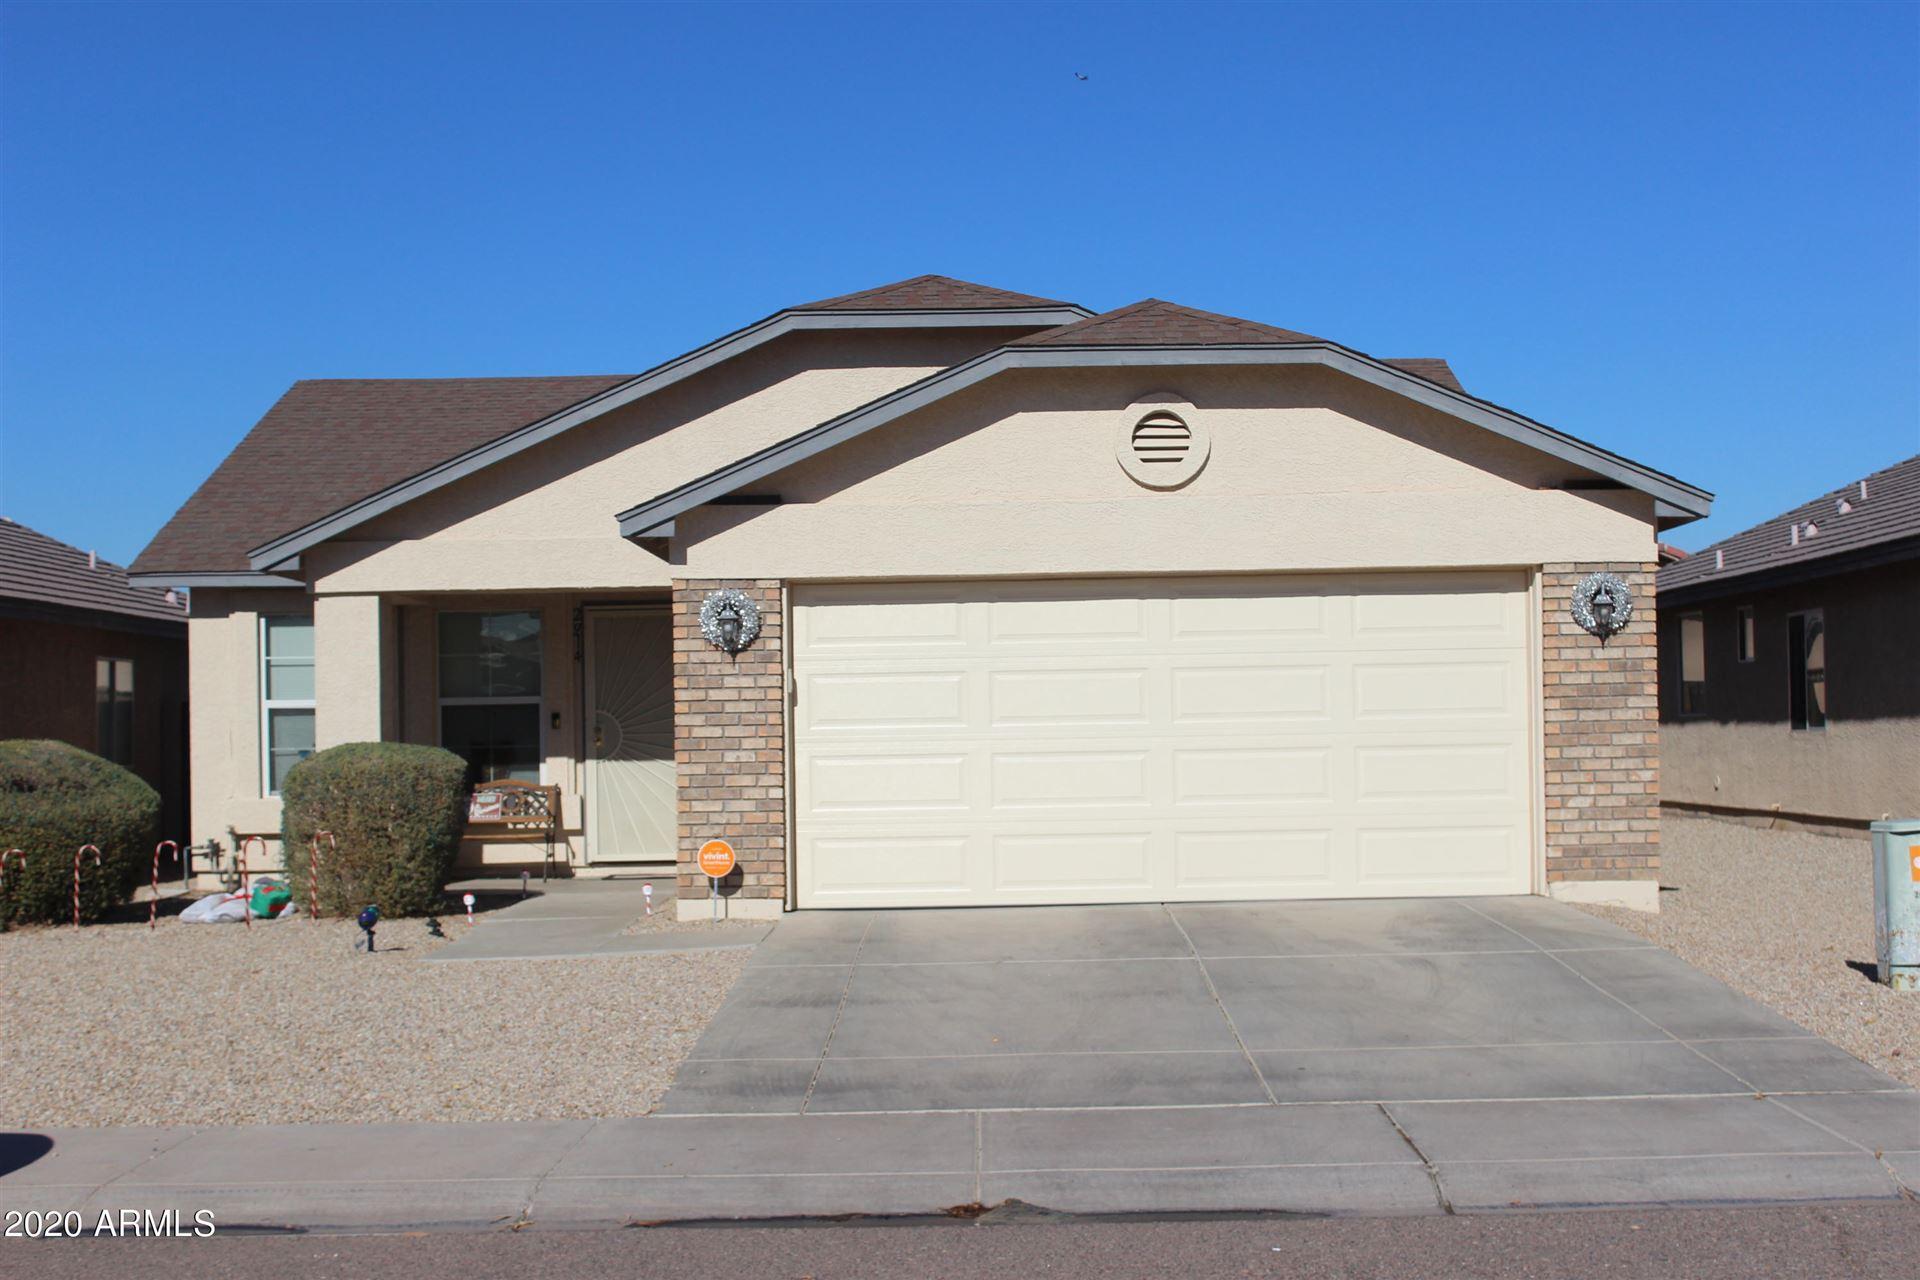 Photo of 2914 W CHANUTE Pass, Phoenix, AZ 85041 (MLS # 6174855)